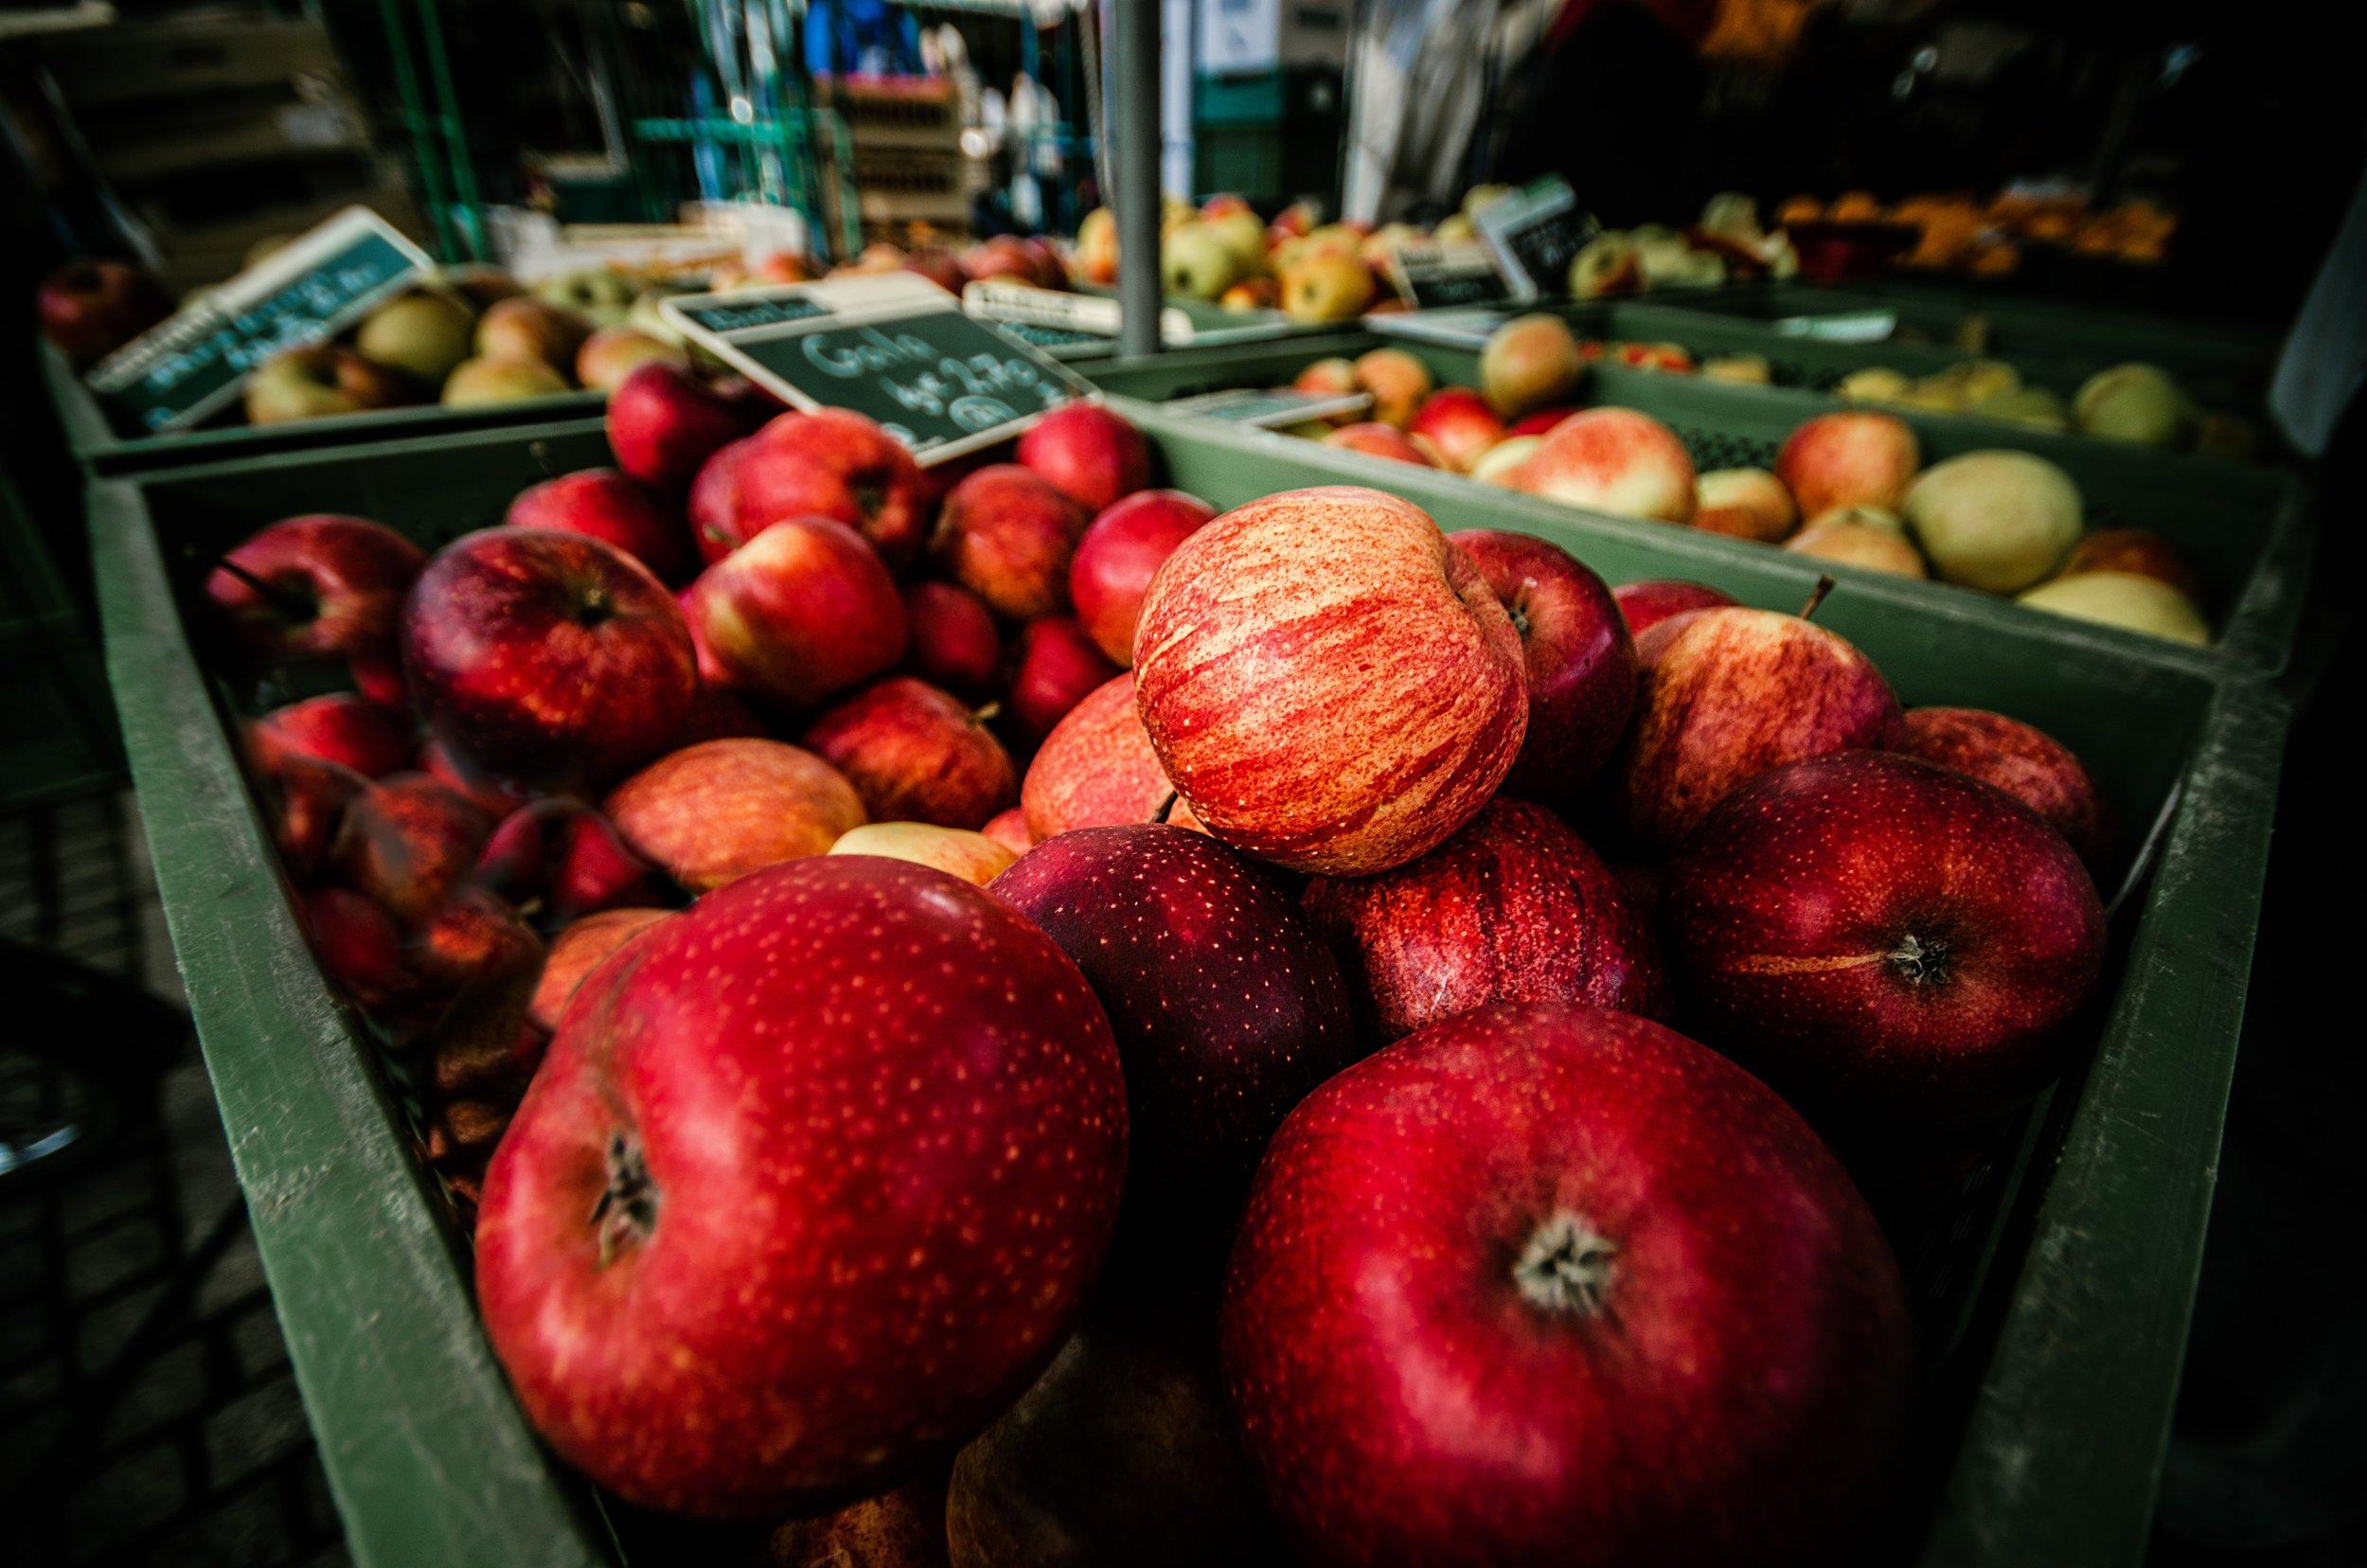 abundance-apples-blur-349730.jpg